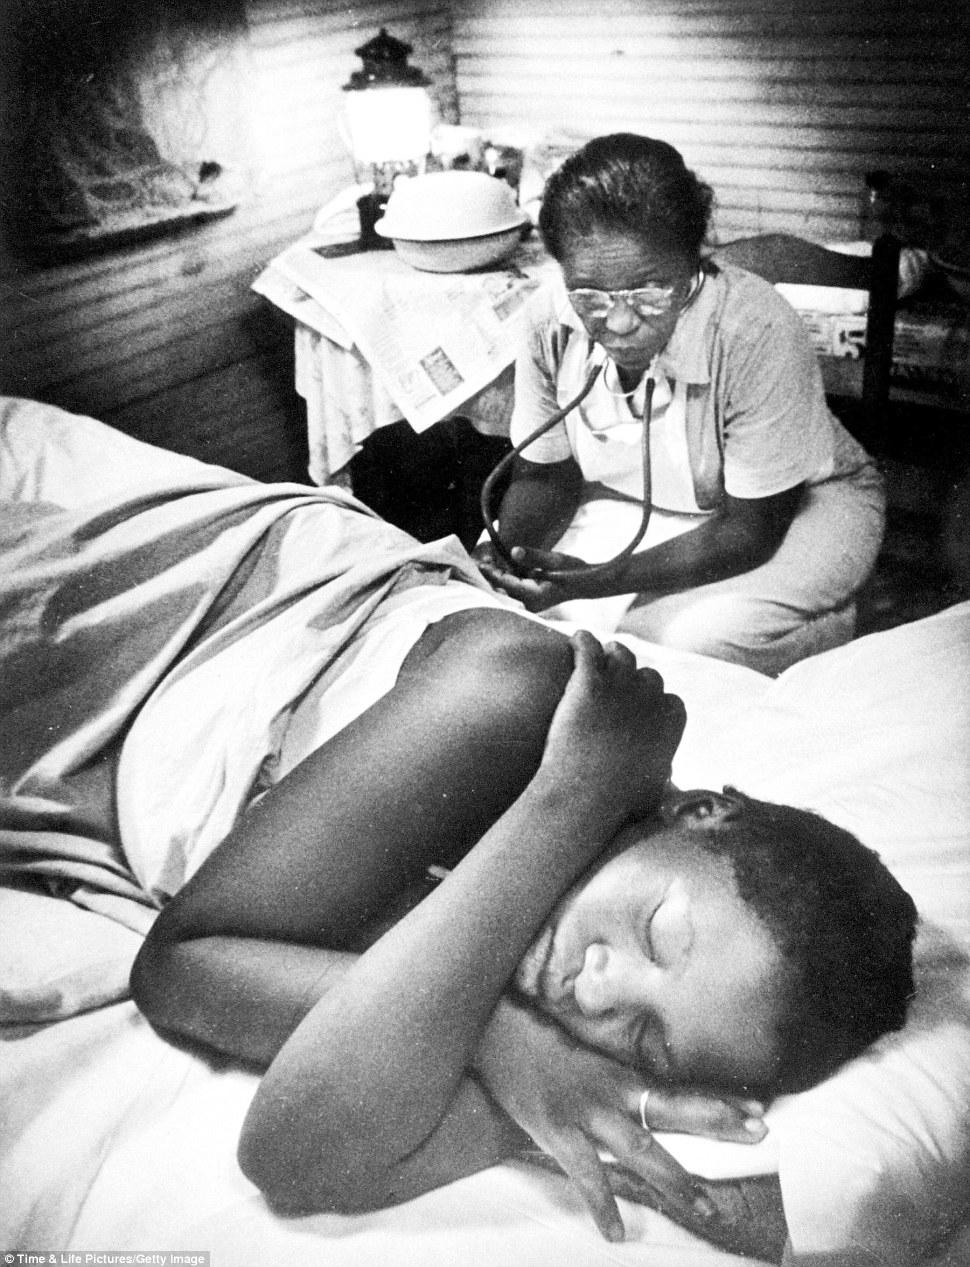 Safe under her watchful eye: Maude Callen attends to a woman in labor